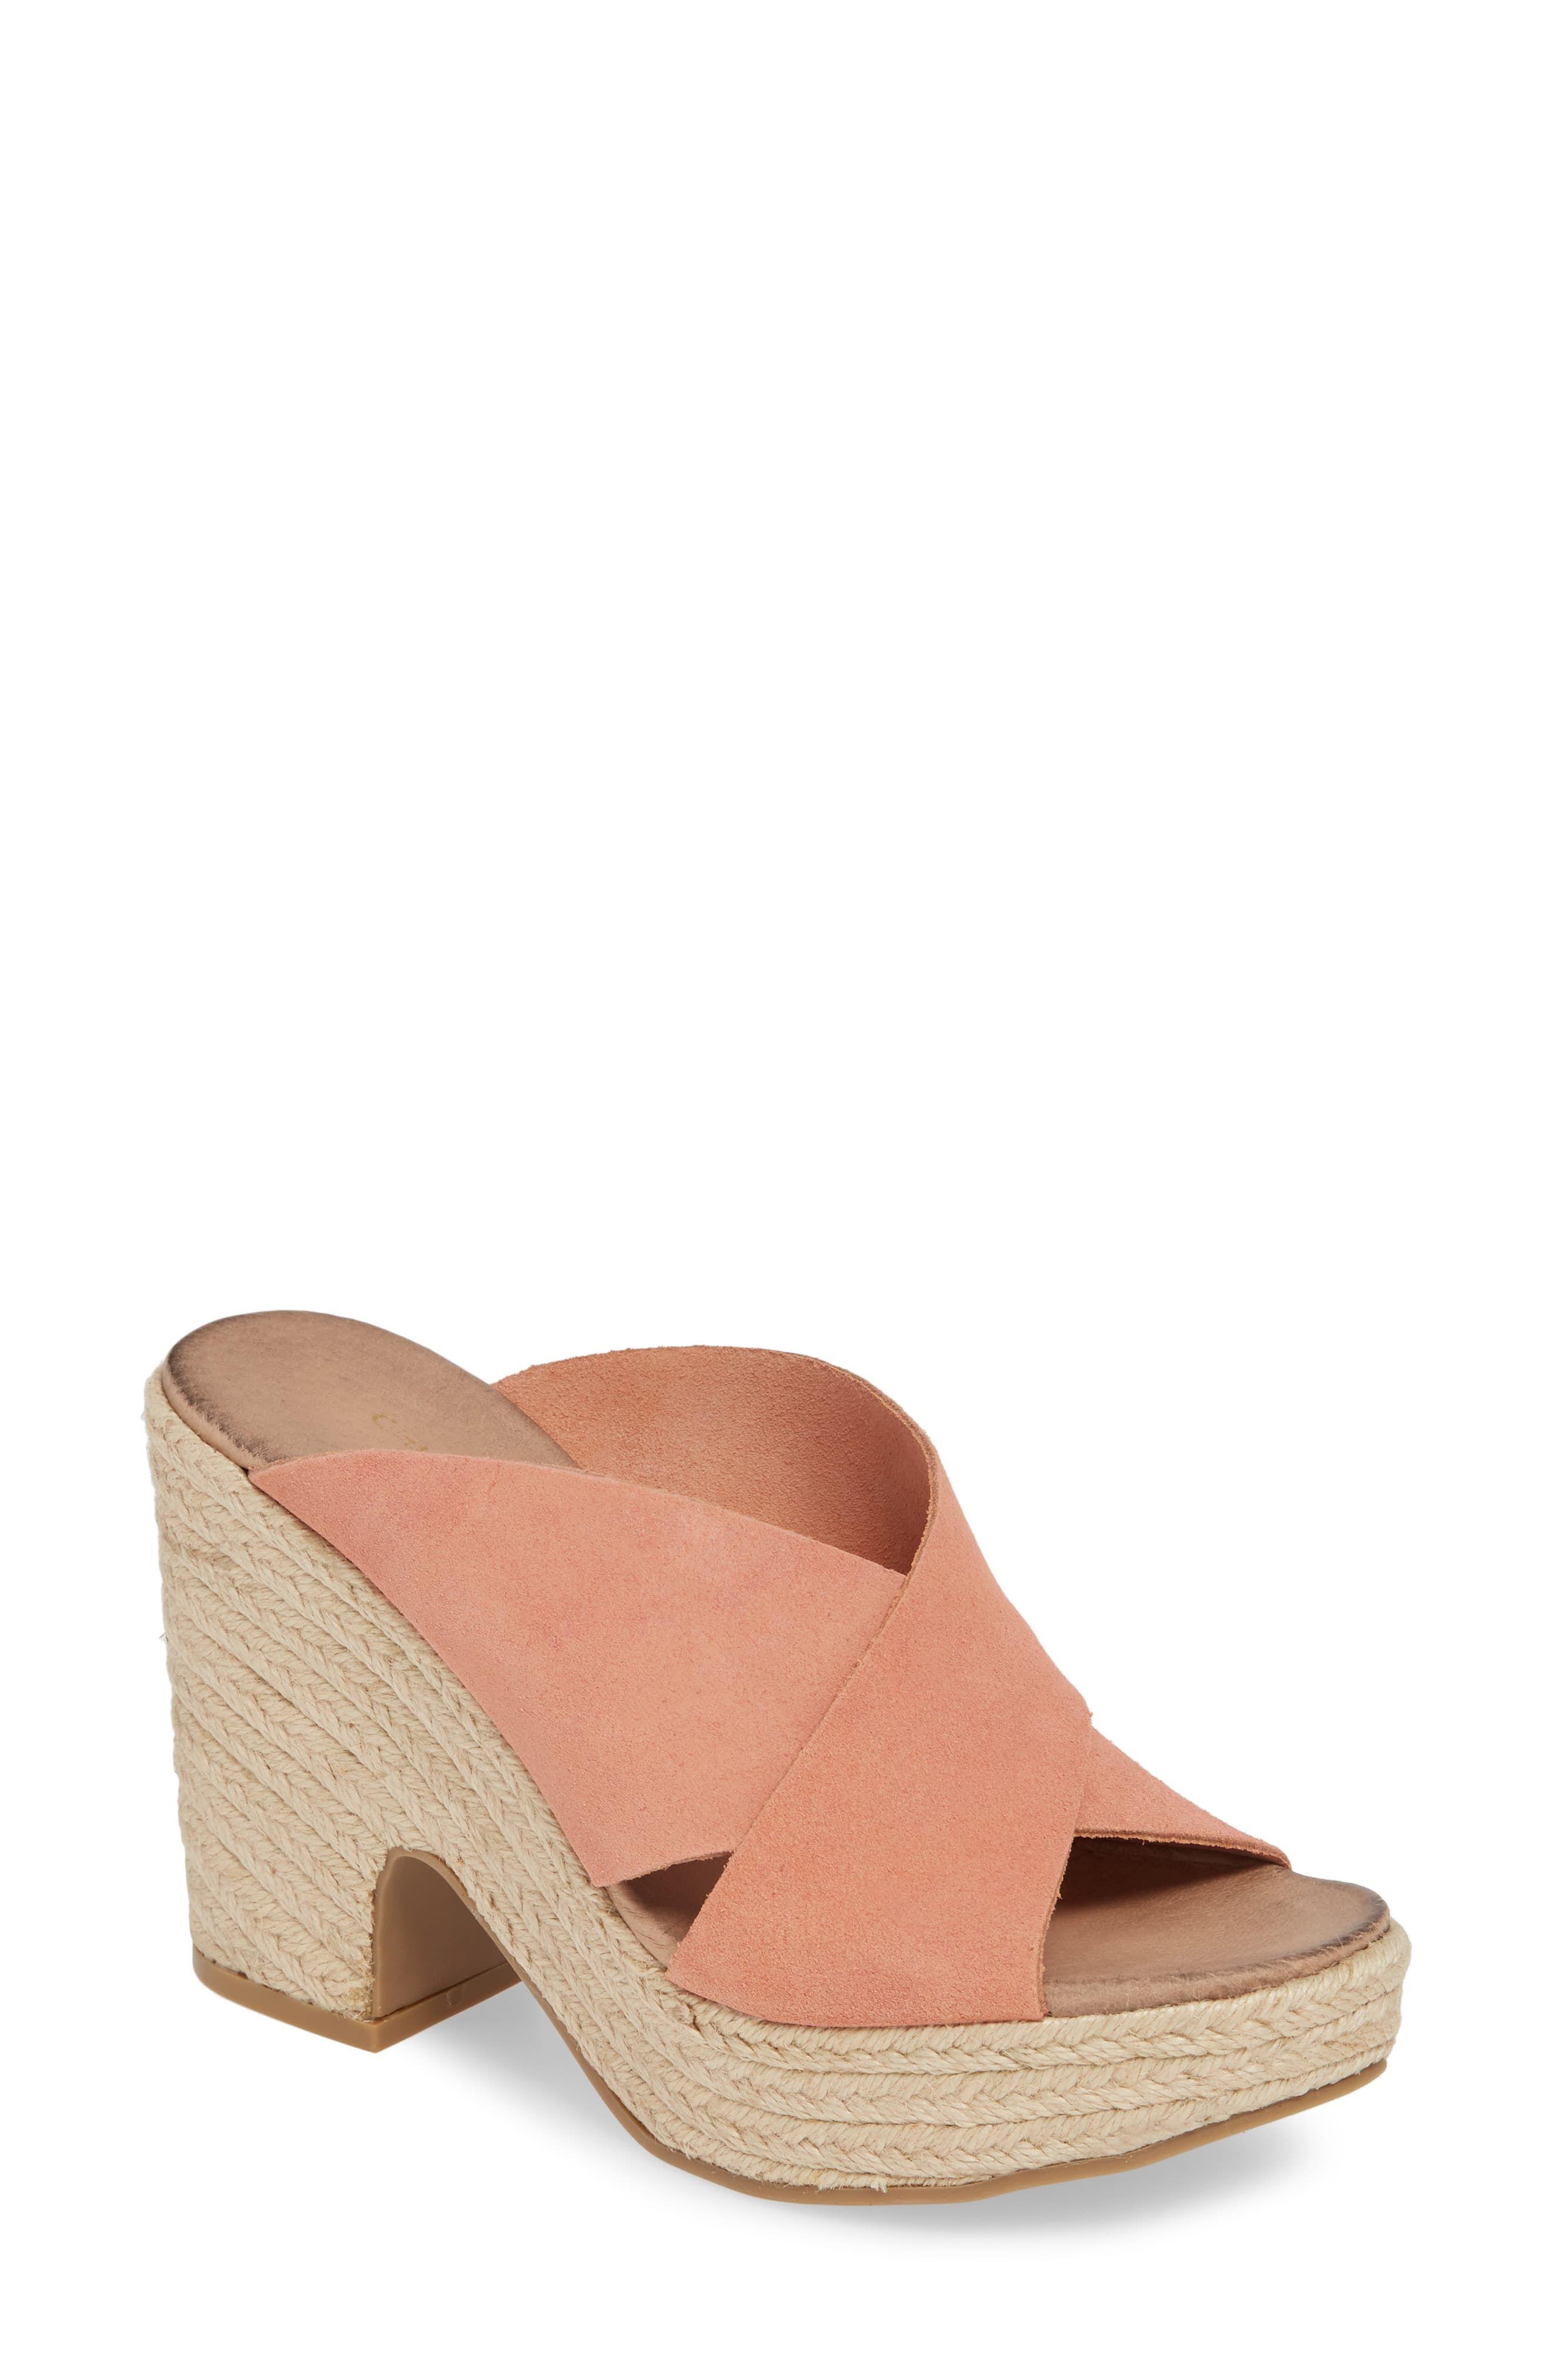 Women S Chinese Laundry Quay Platform Sandal Size 7 5 M Pink